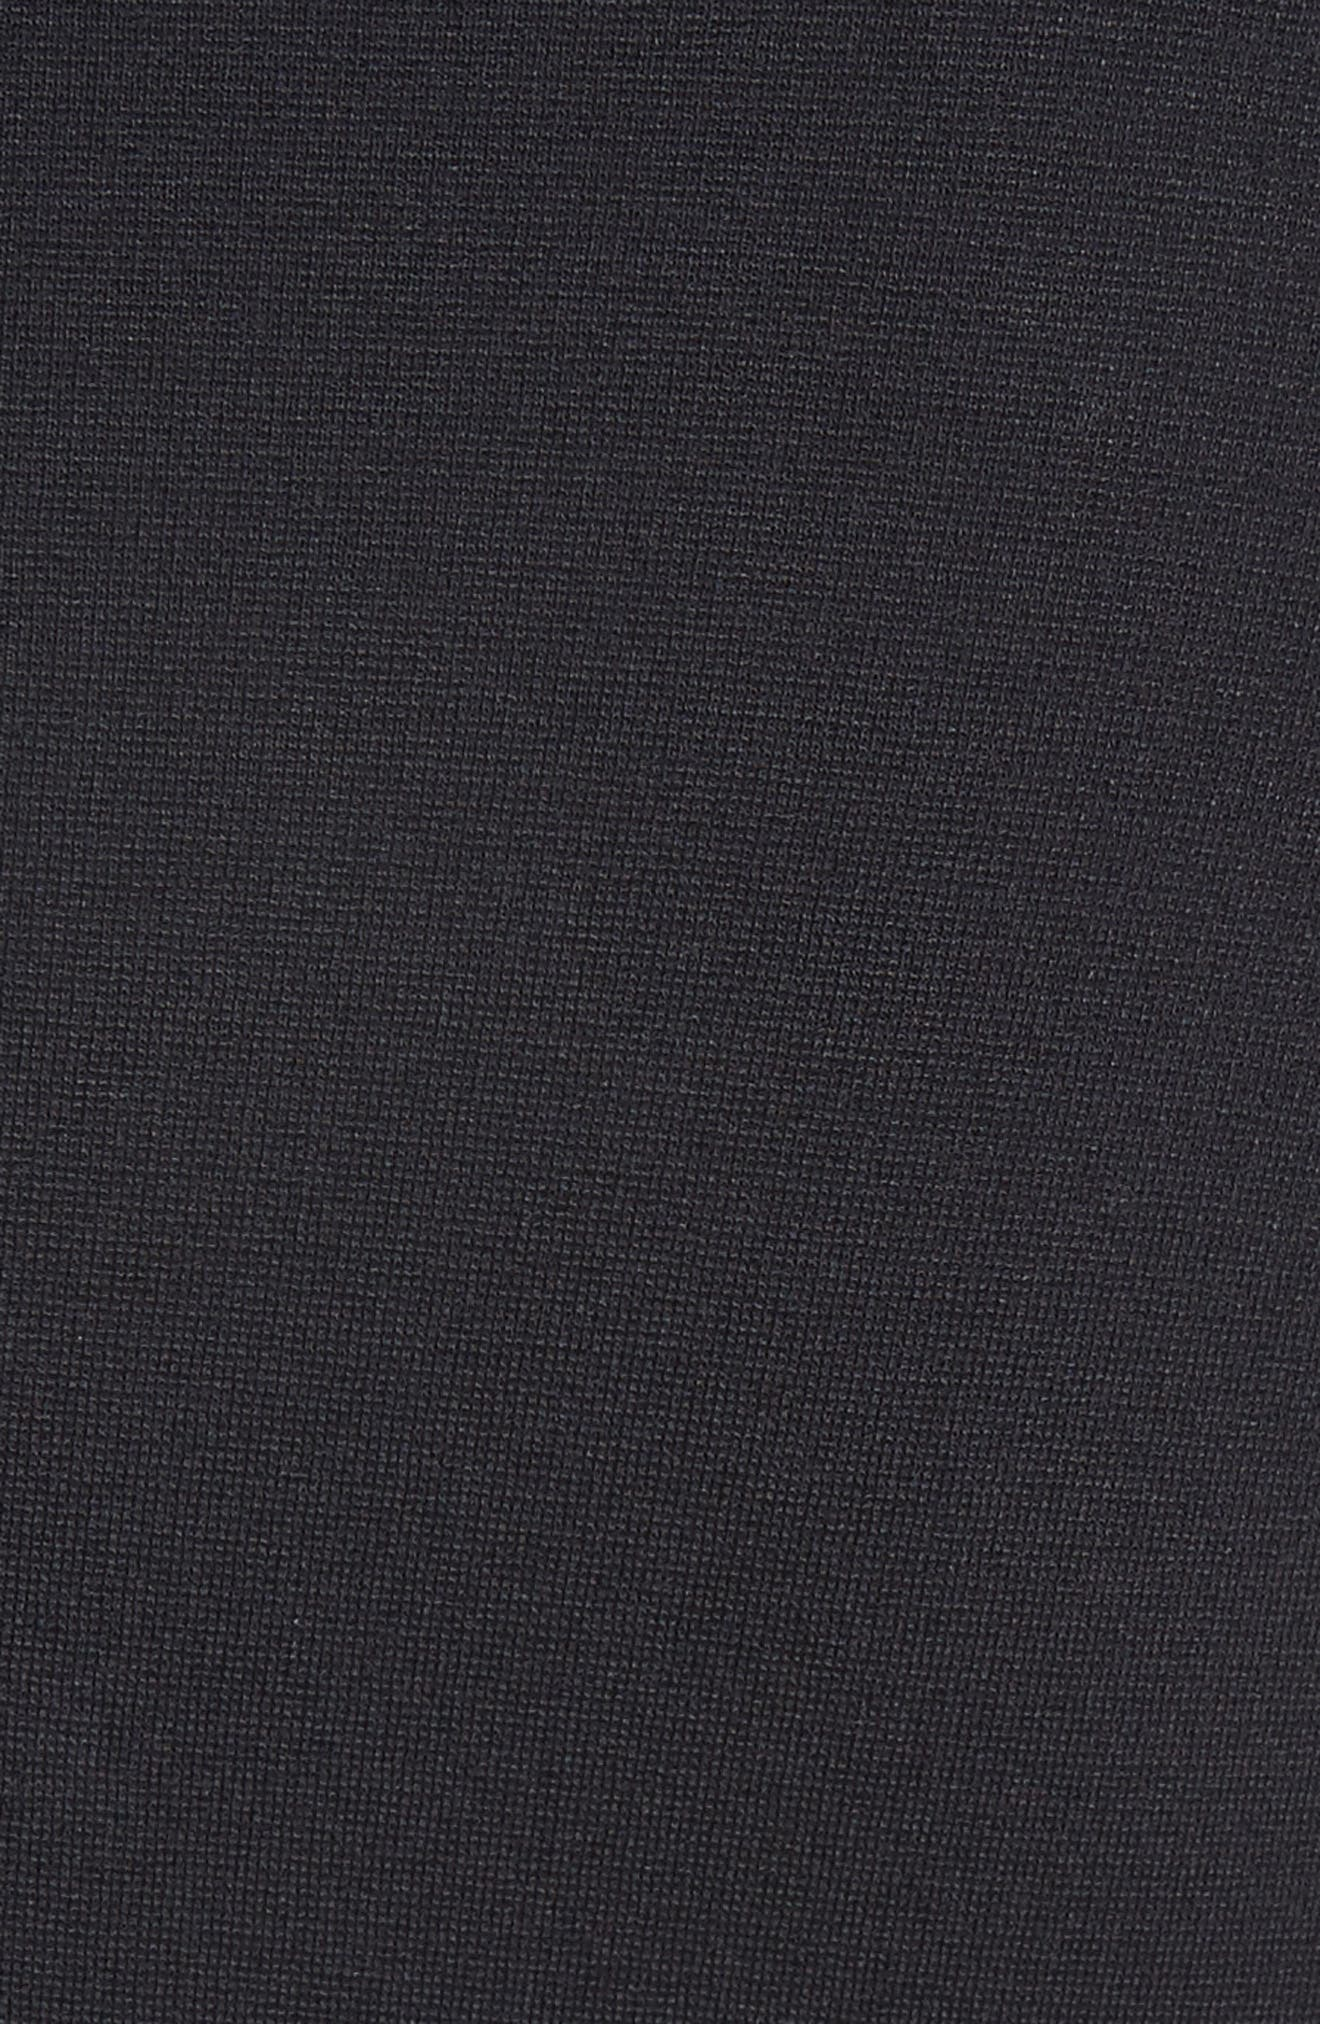 Alternate Image 3  - Armani Collezioni Seamed Jersey Fit & Flare Dress